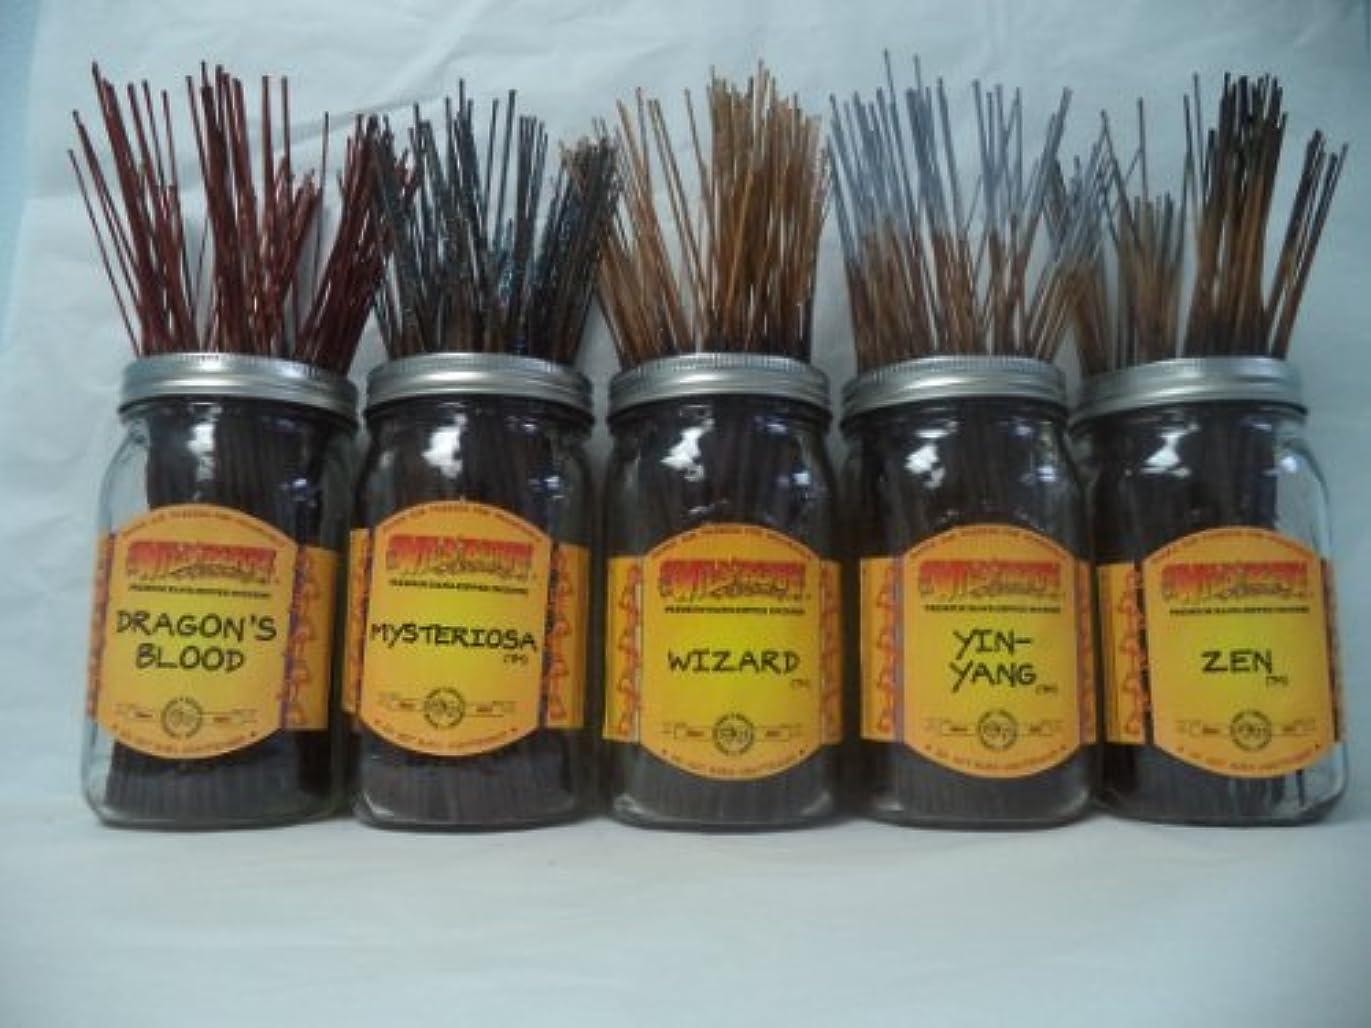 Wildberry Incense Sticks Earthy Scentsセット# 3 : 20 Sticks各5の香り、合計100 Sticks 。